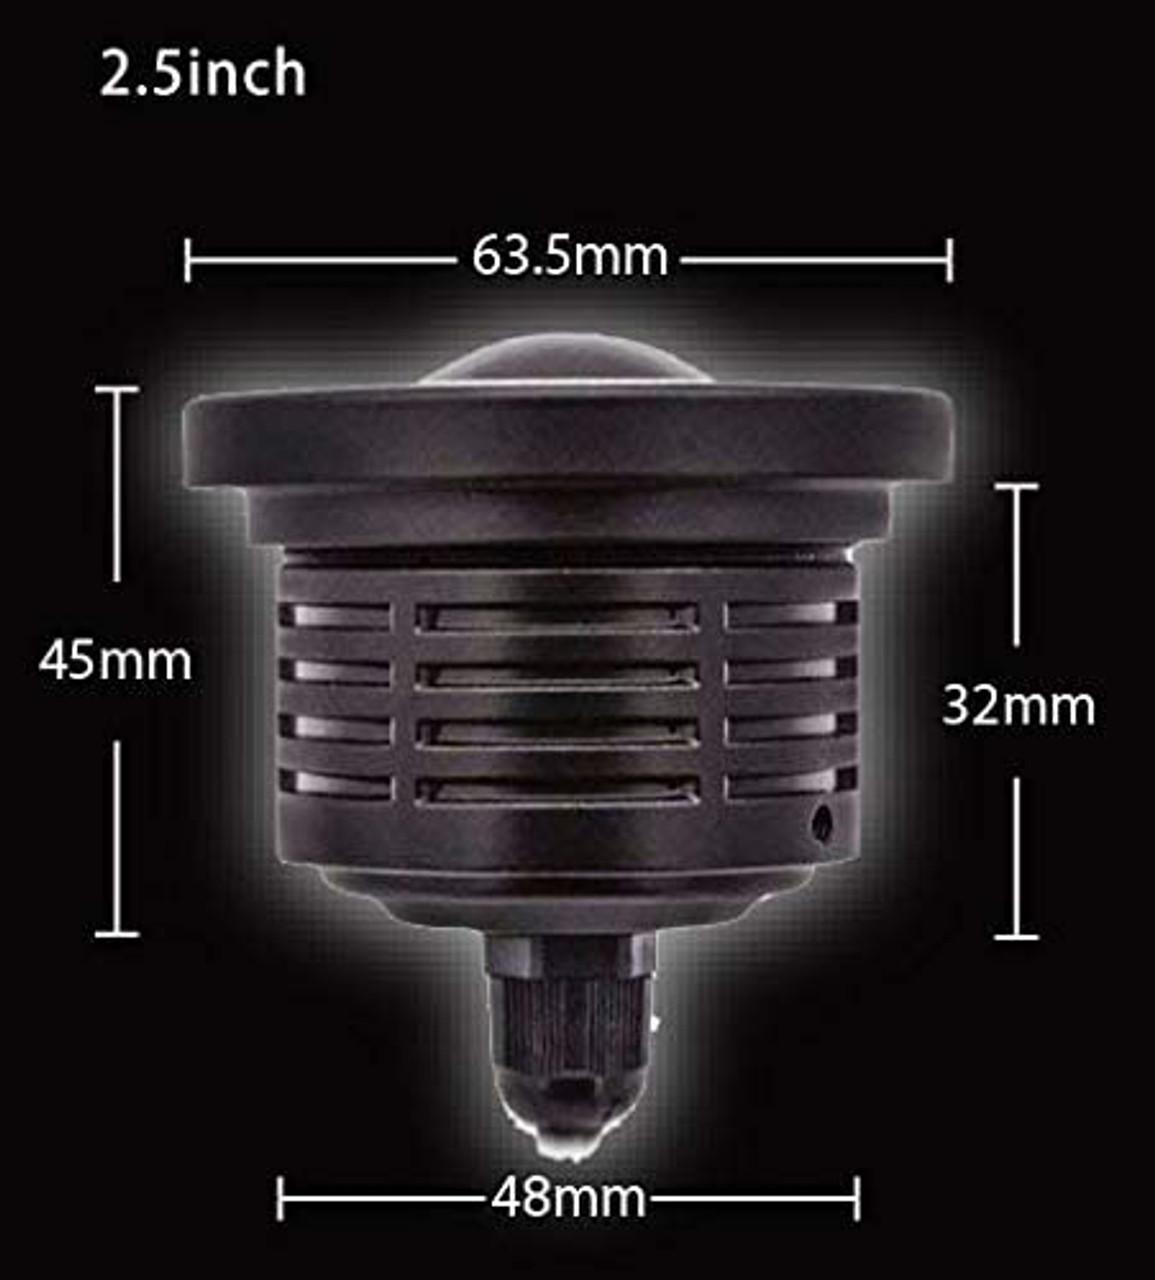 Bottom LED Halo Fog Lights for 2021 2022 2023 Chevrolet Trailblazer L LS LT ACTIV